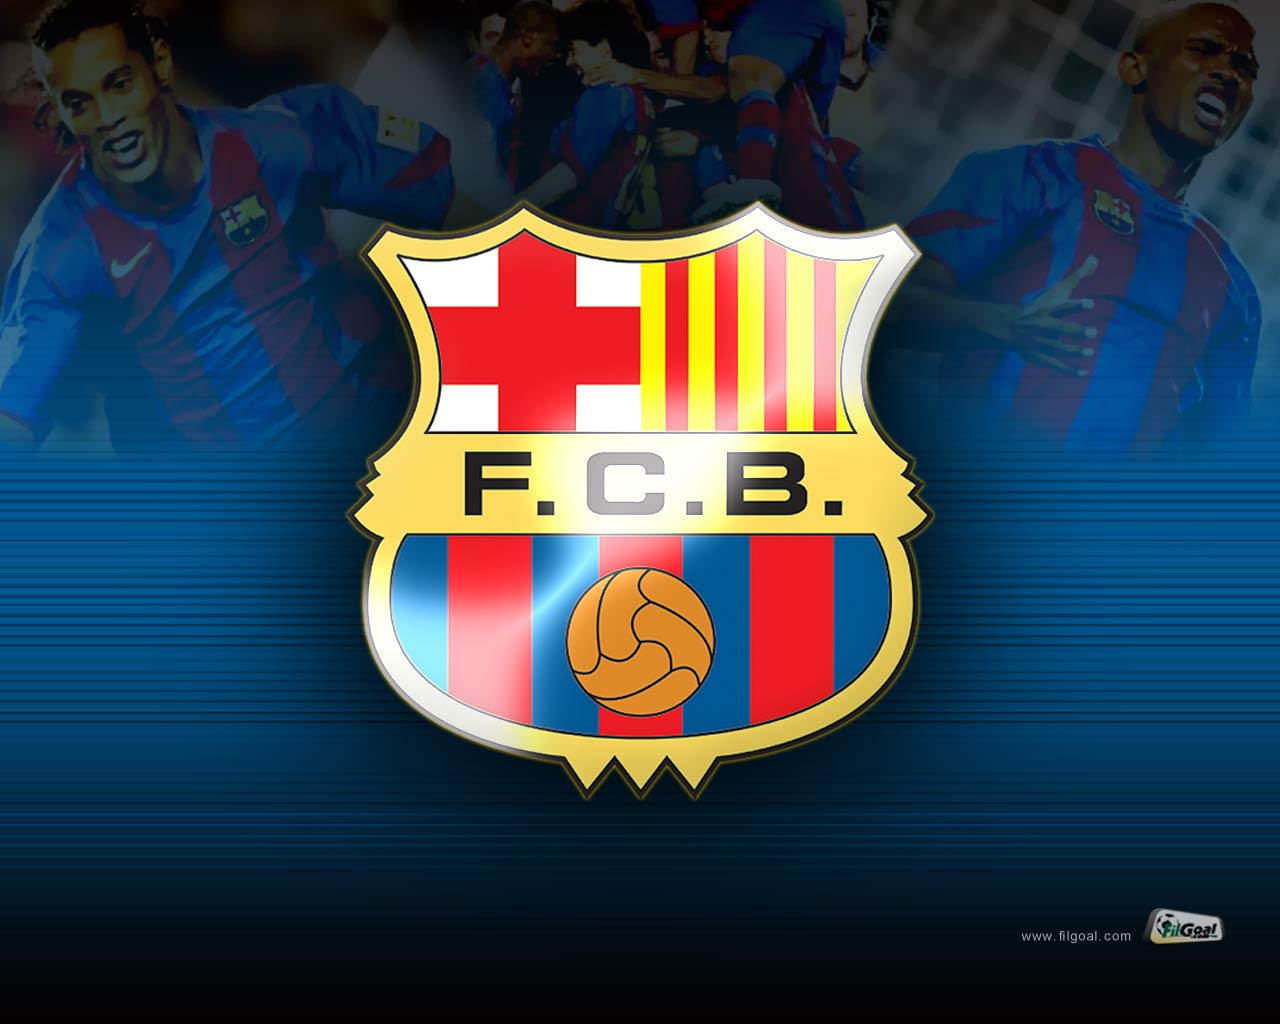 Fans club barcelona blogs barcelona for Club de fumadores barcelona